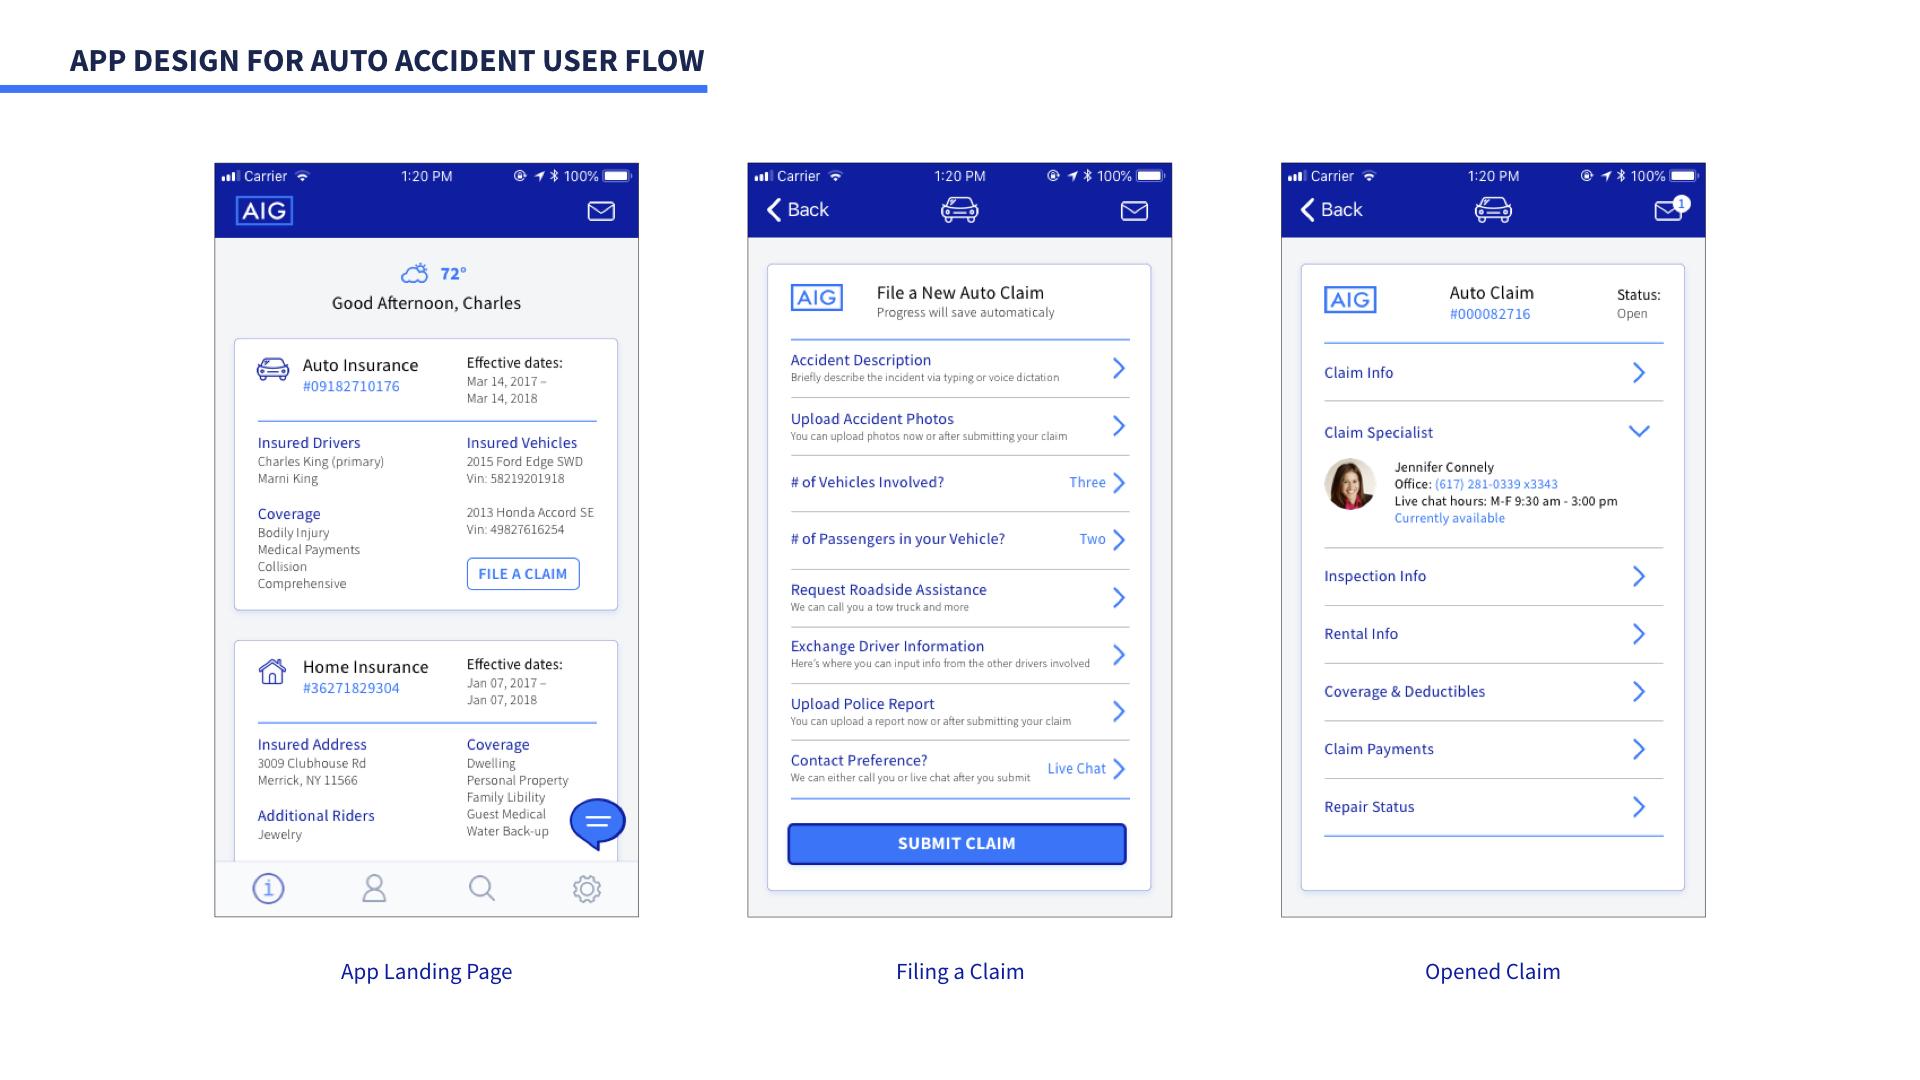 App Design for Auto Accident User Flow